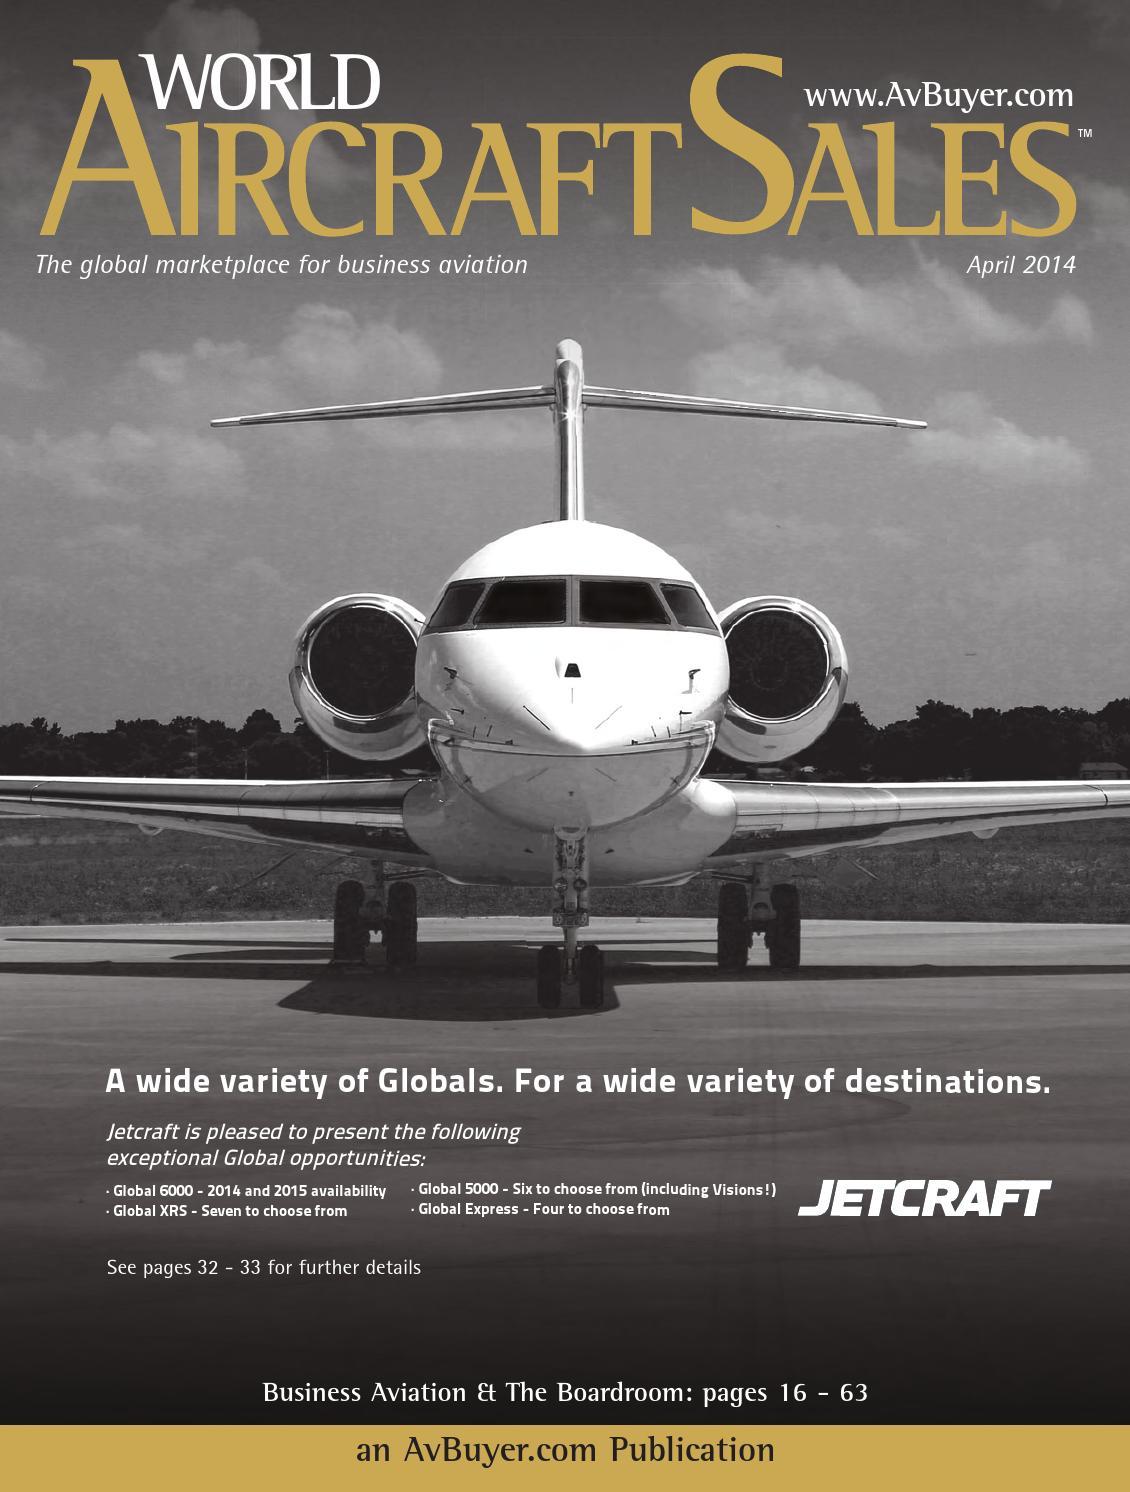 World Aircraft Sales Magazine April 2014 by AvBuyer Ltd  - issuu